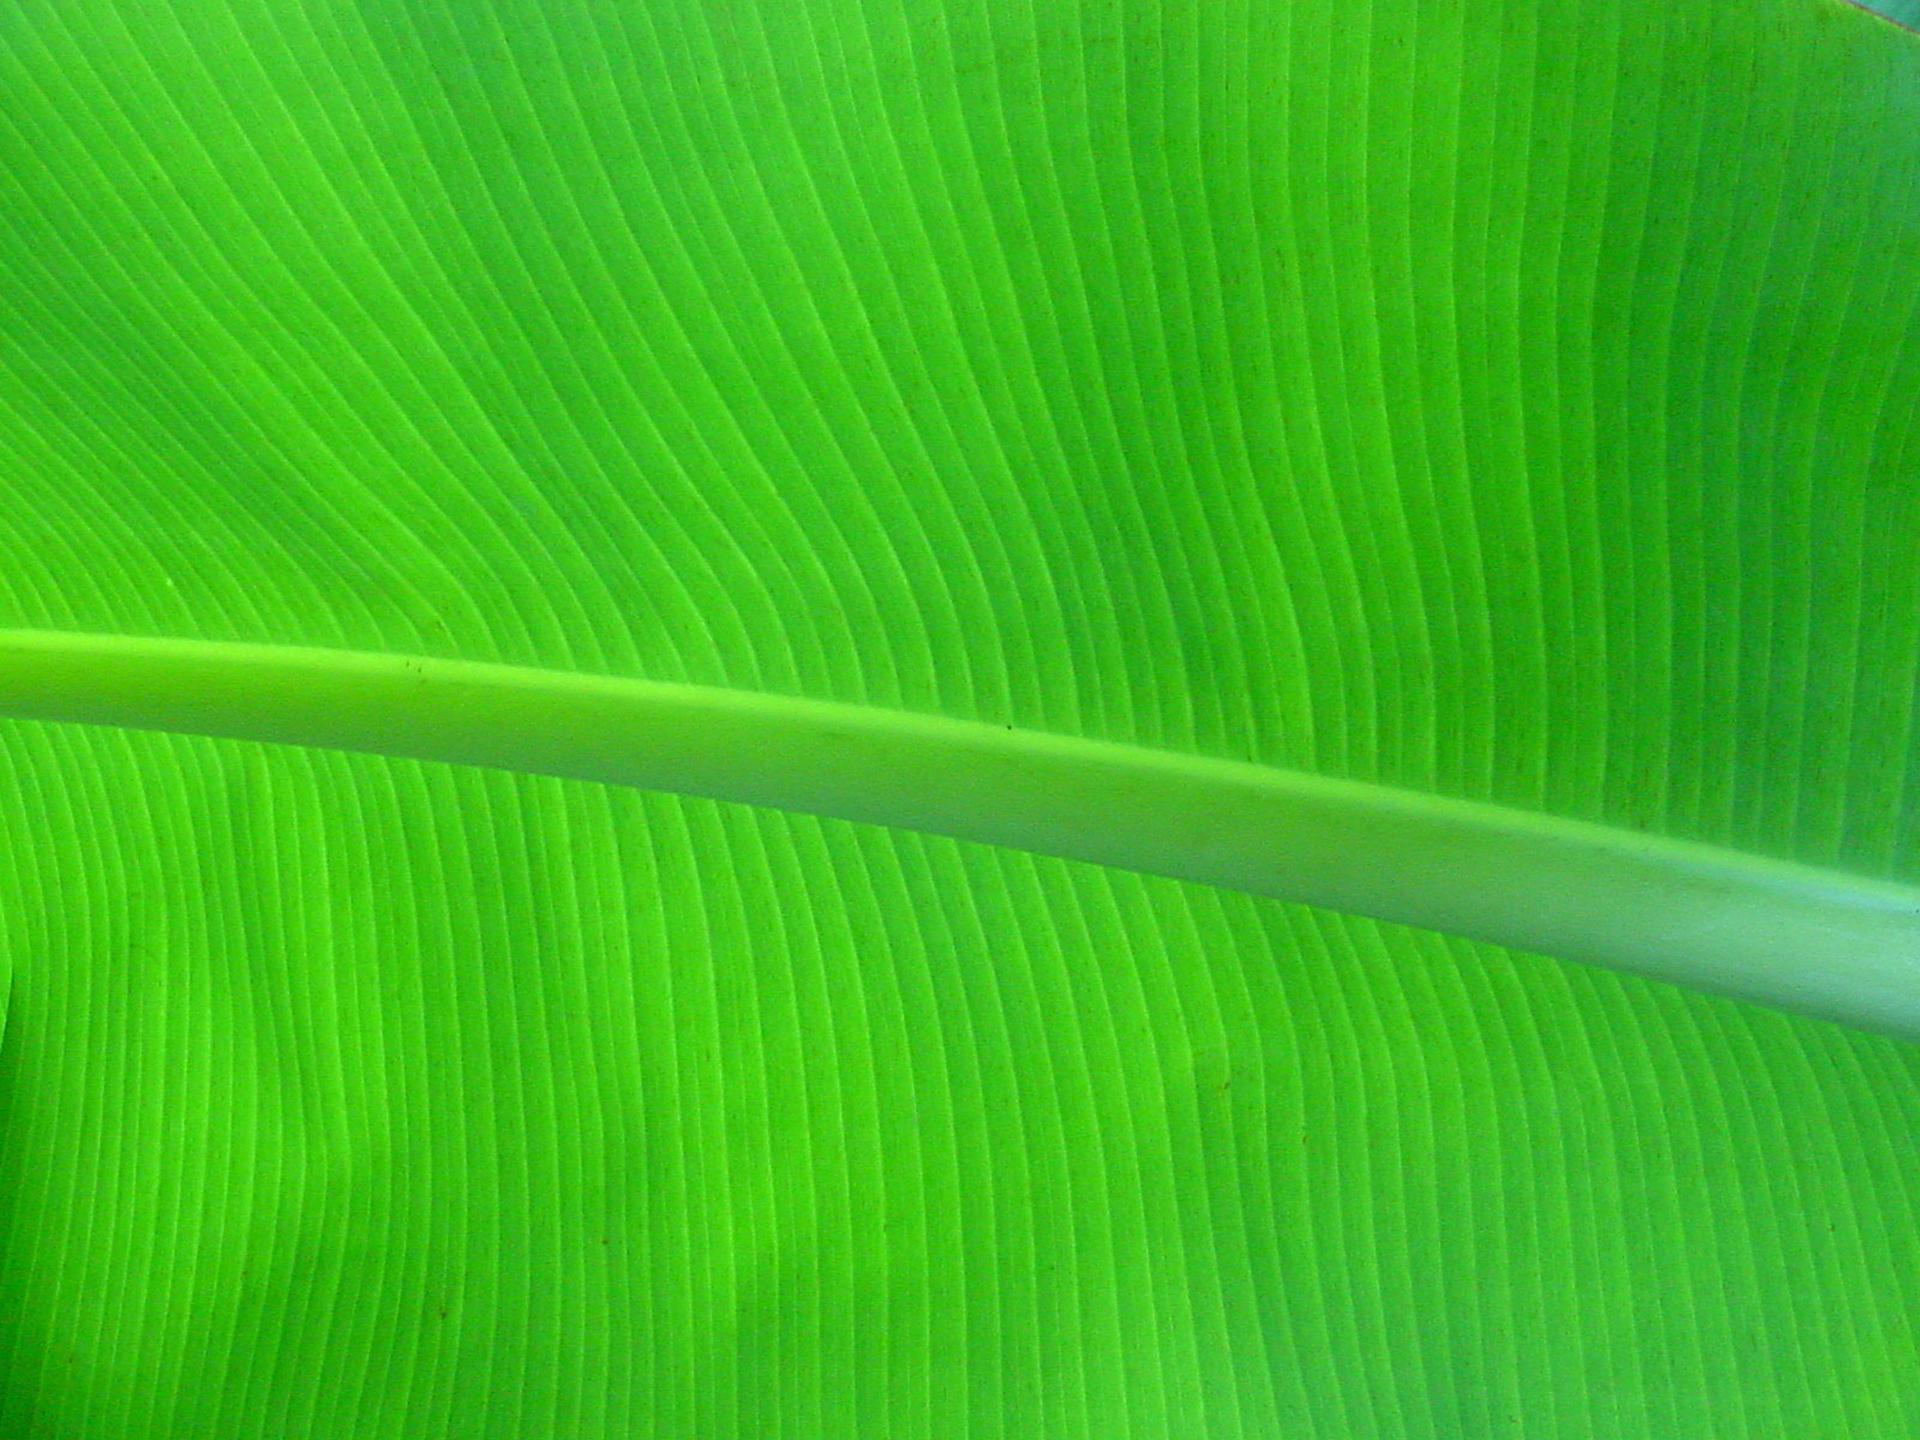 Hipster Fall Wallpaper Banana Leaf Images Free Pixelstalk Net